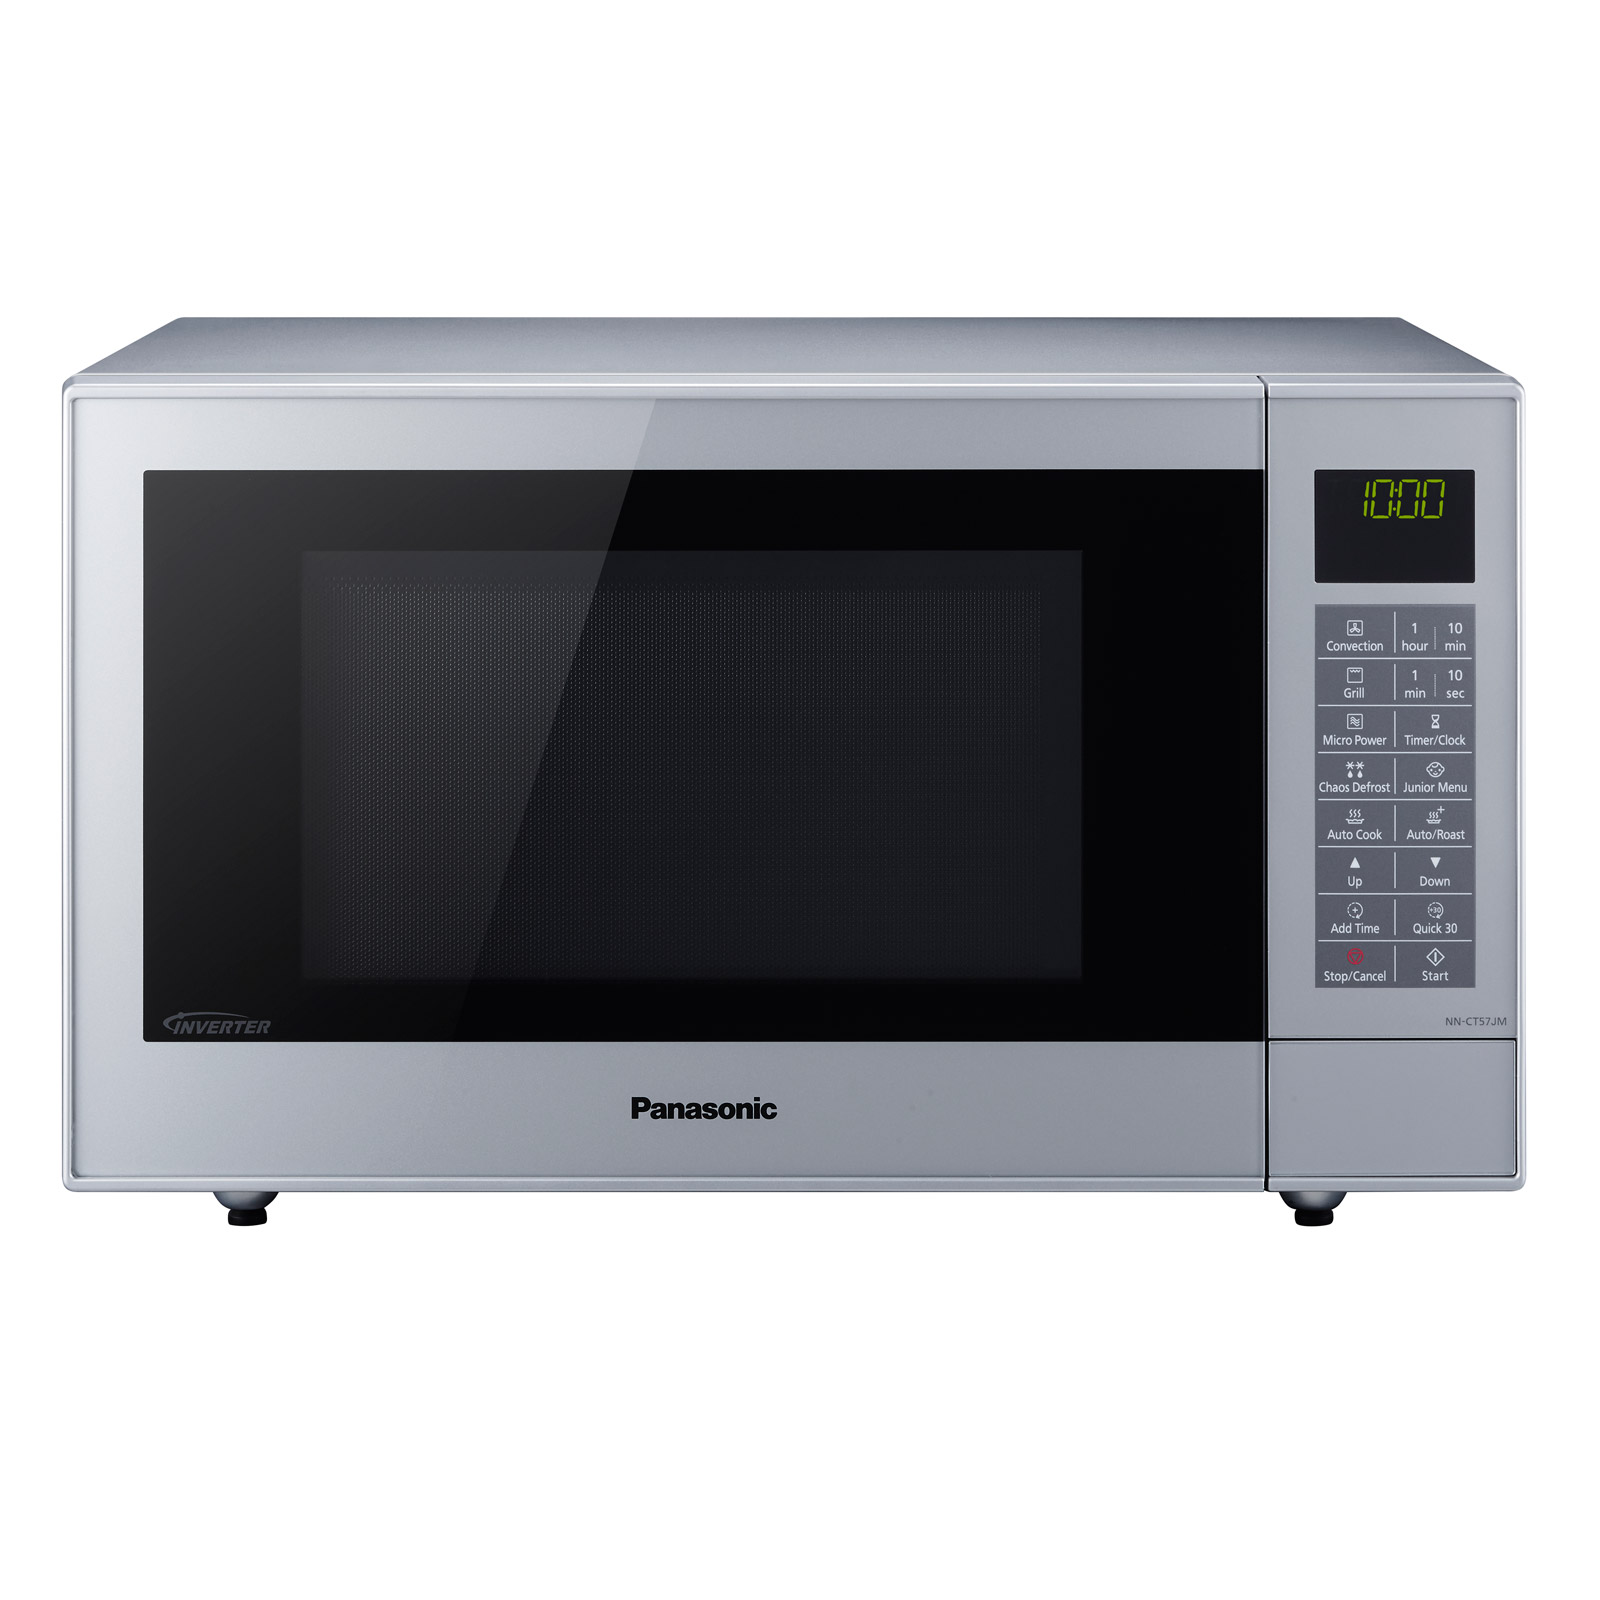 panasonic nn ct57jmbpq combination microwave oven in silver 27 rh sonicdirect co uk Panasonic Genius Inverter Microwave Panasonic Genius Inverter Microwave